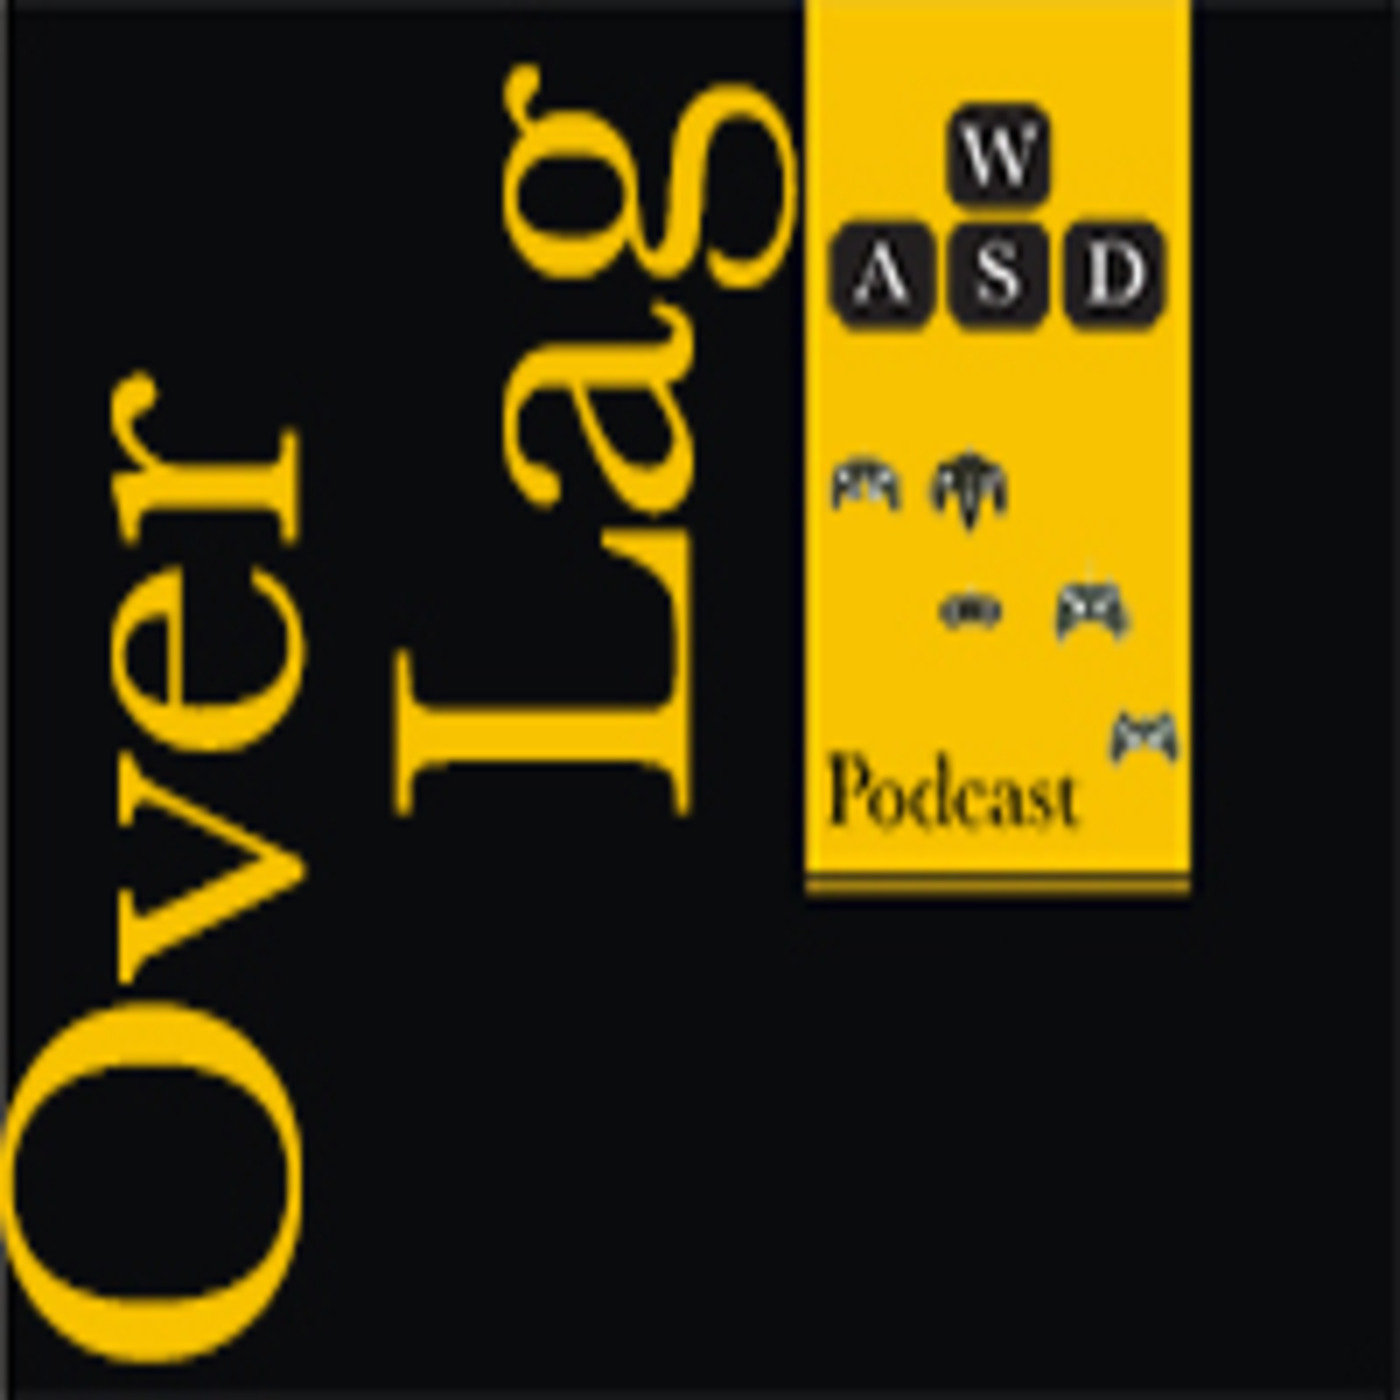 <![CDATA[Over Lag podcast]]>